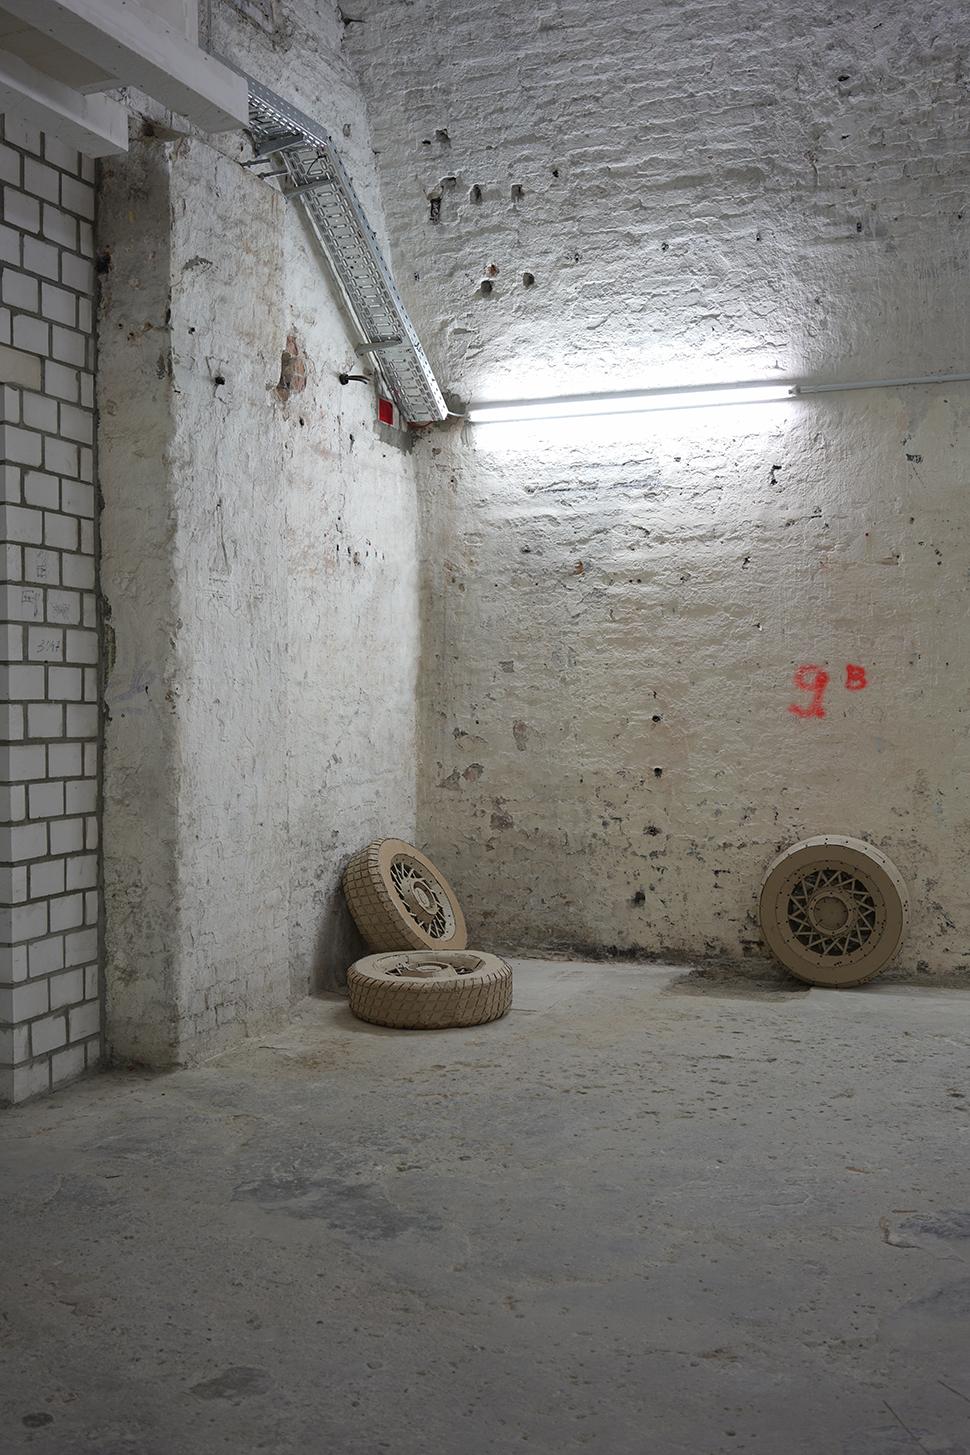 Exhibitionshot Prep 2020, Tires, Cadilactires